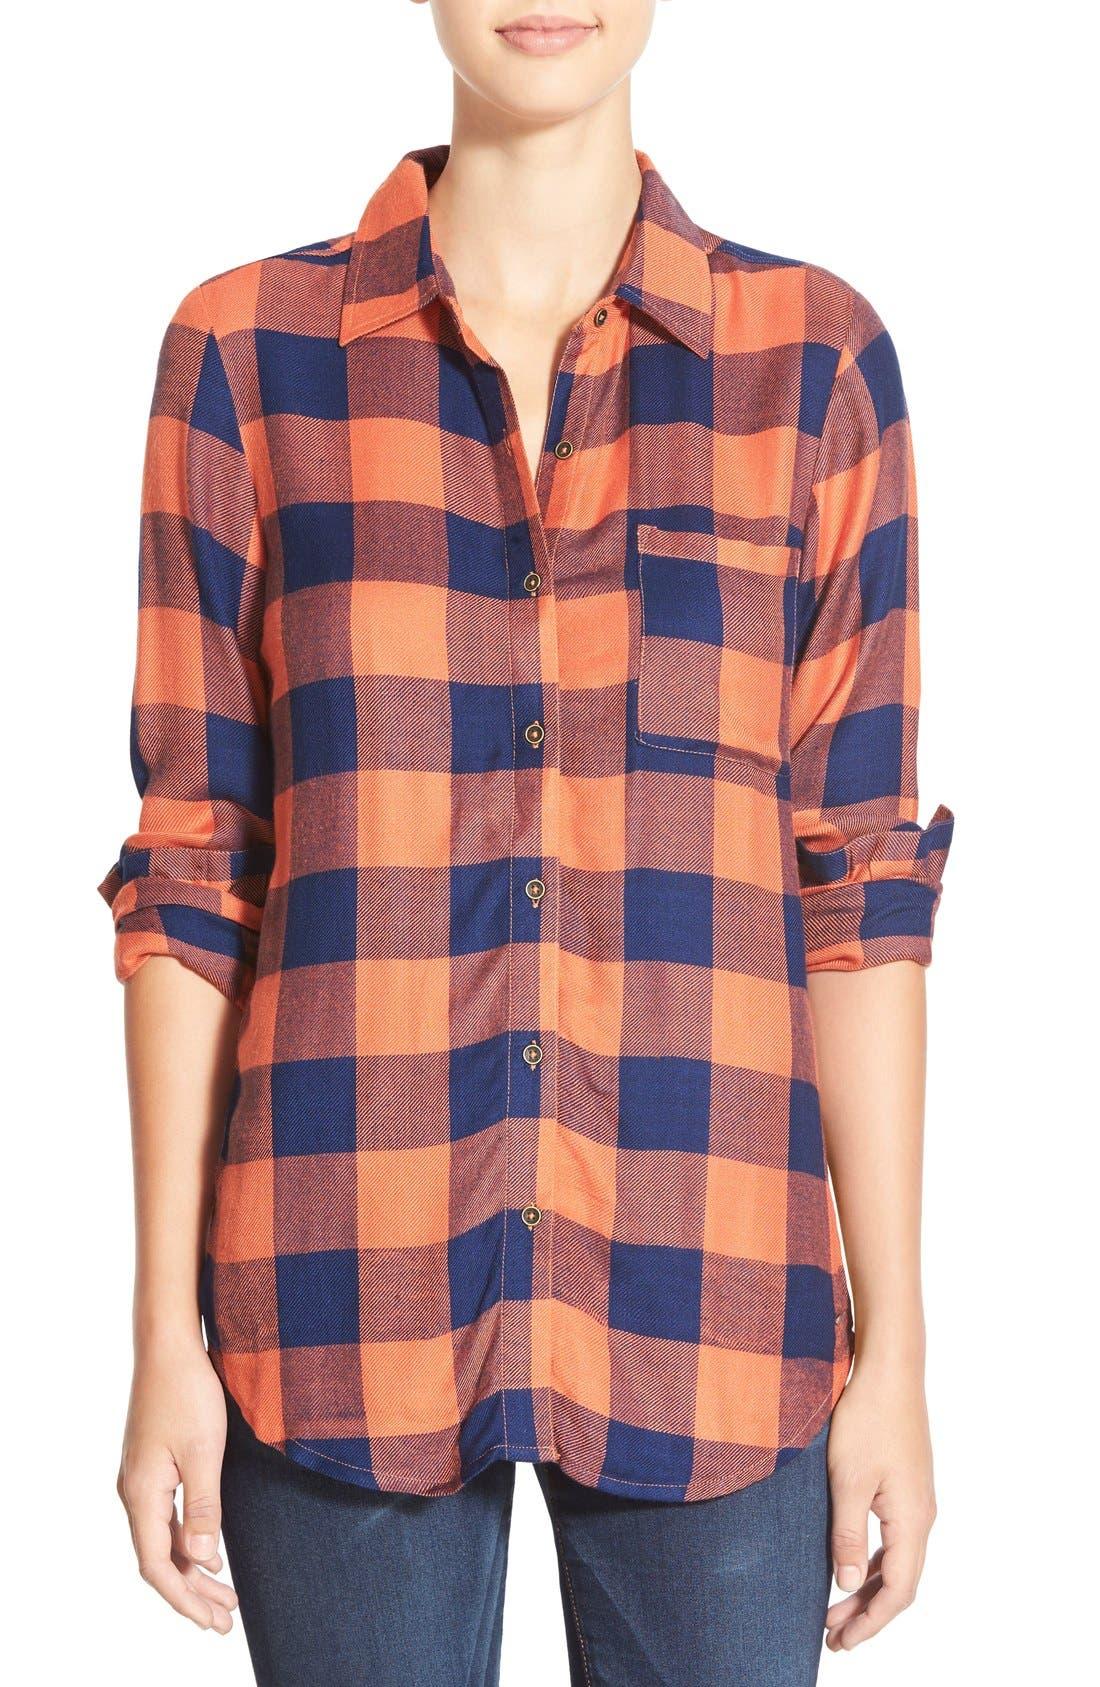 Main Image - Rip Curl 'Dweller' Lace Back Flannel Shirt